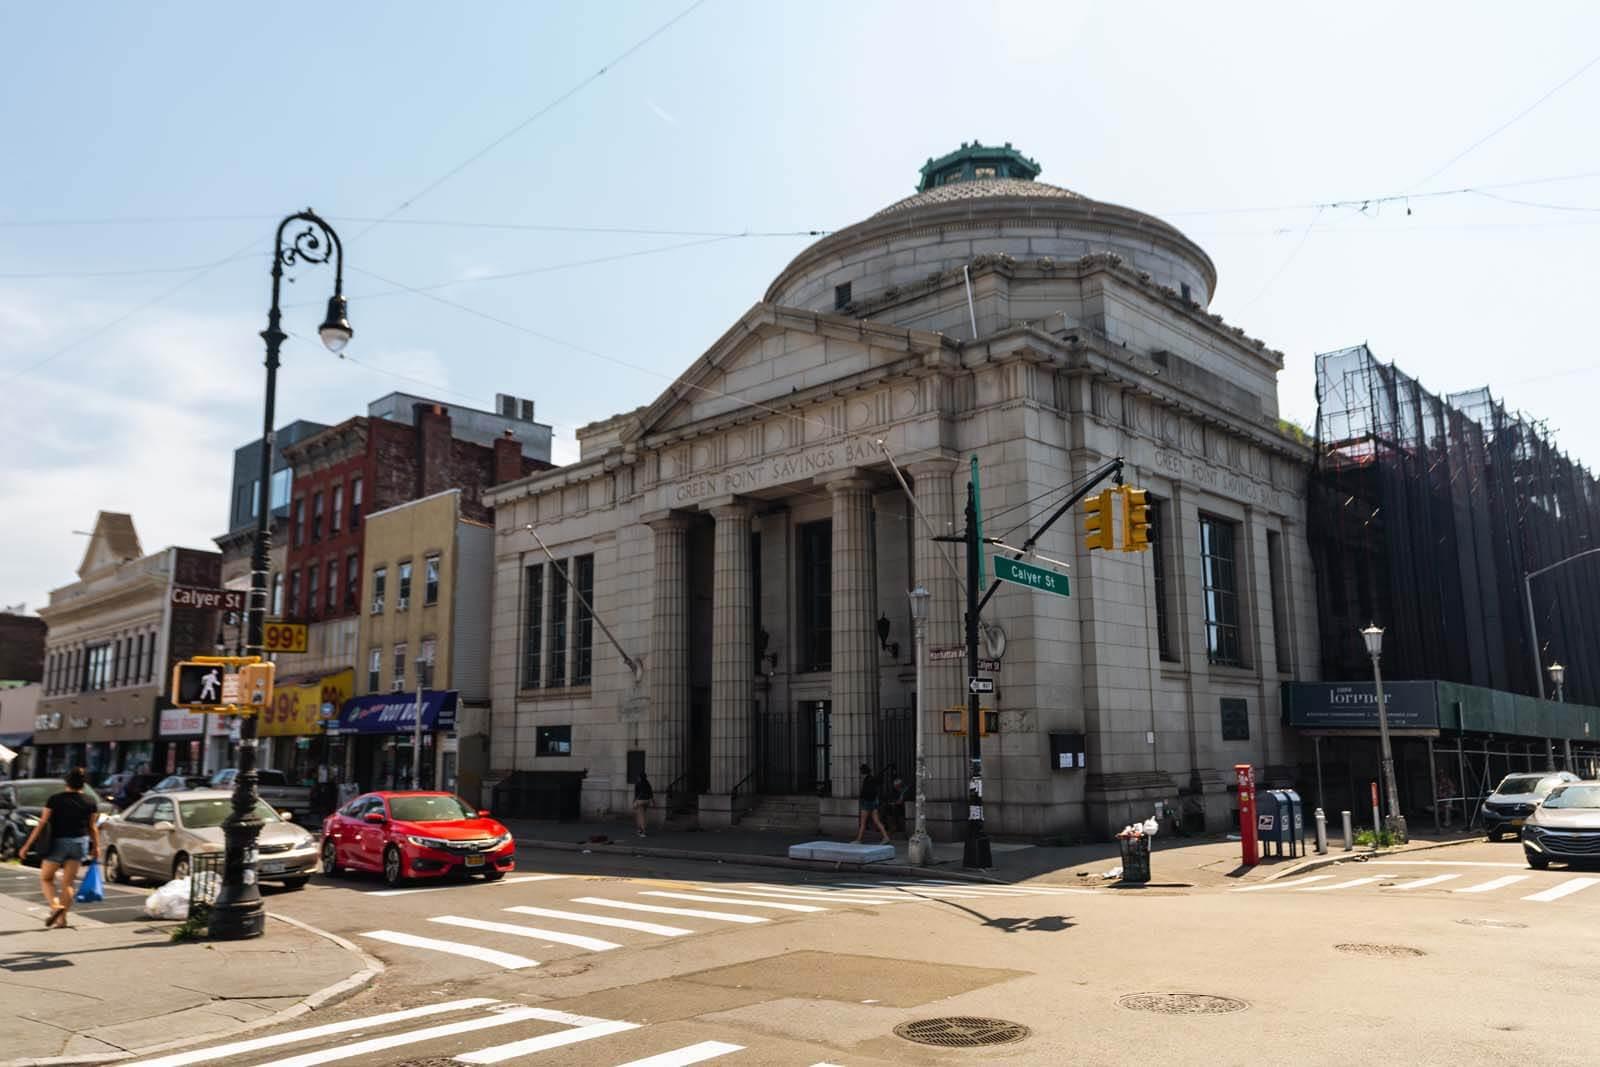 Greenpoint Savings Bank bulding in Greenpoint Brooklyn